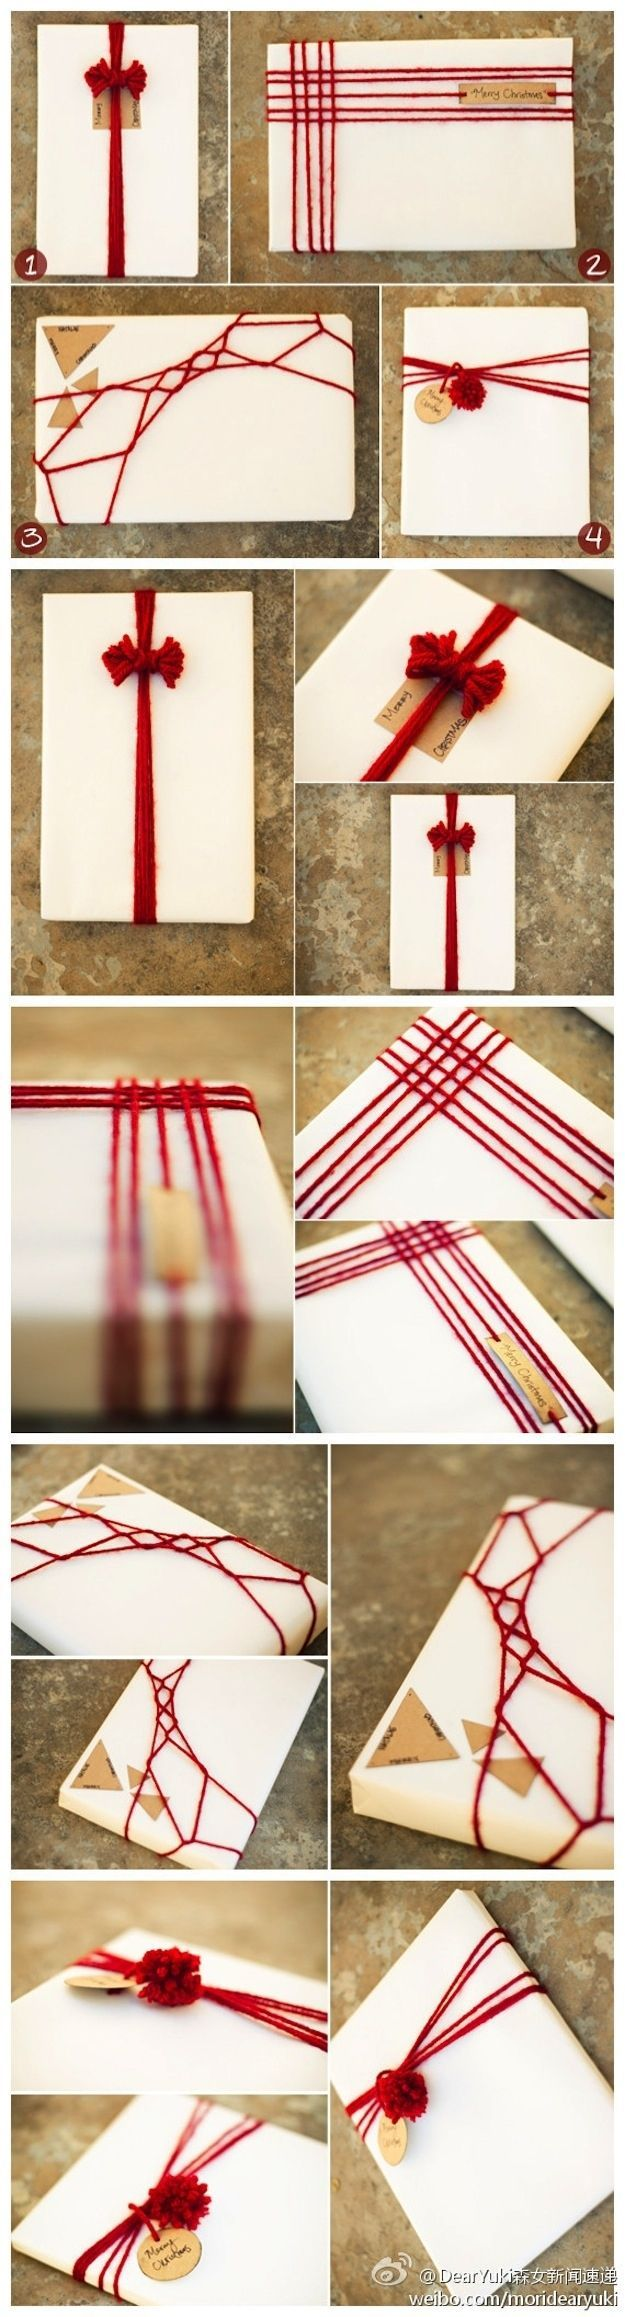 Yarn Gift Wrapping.